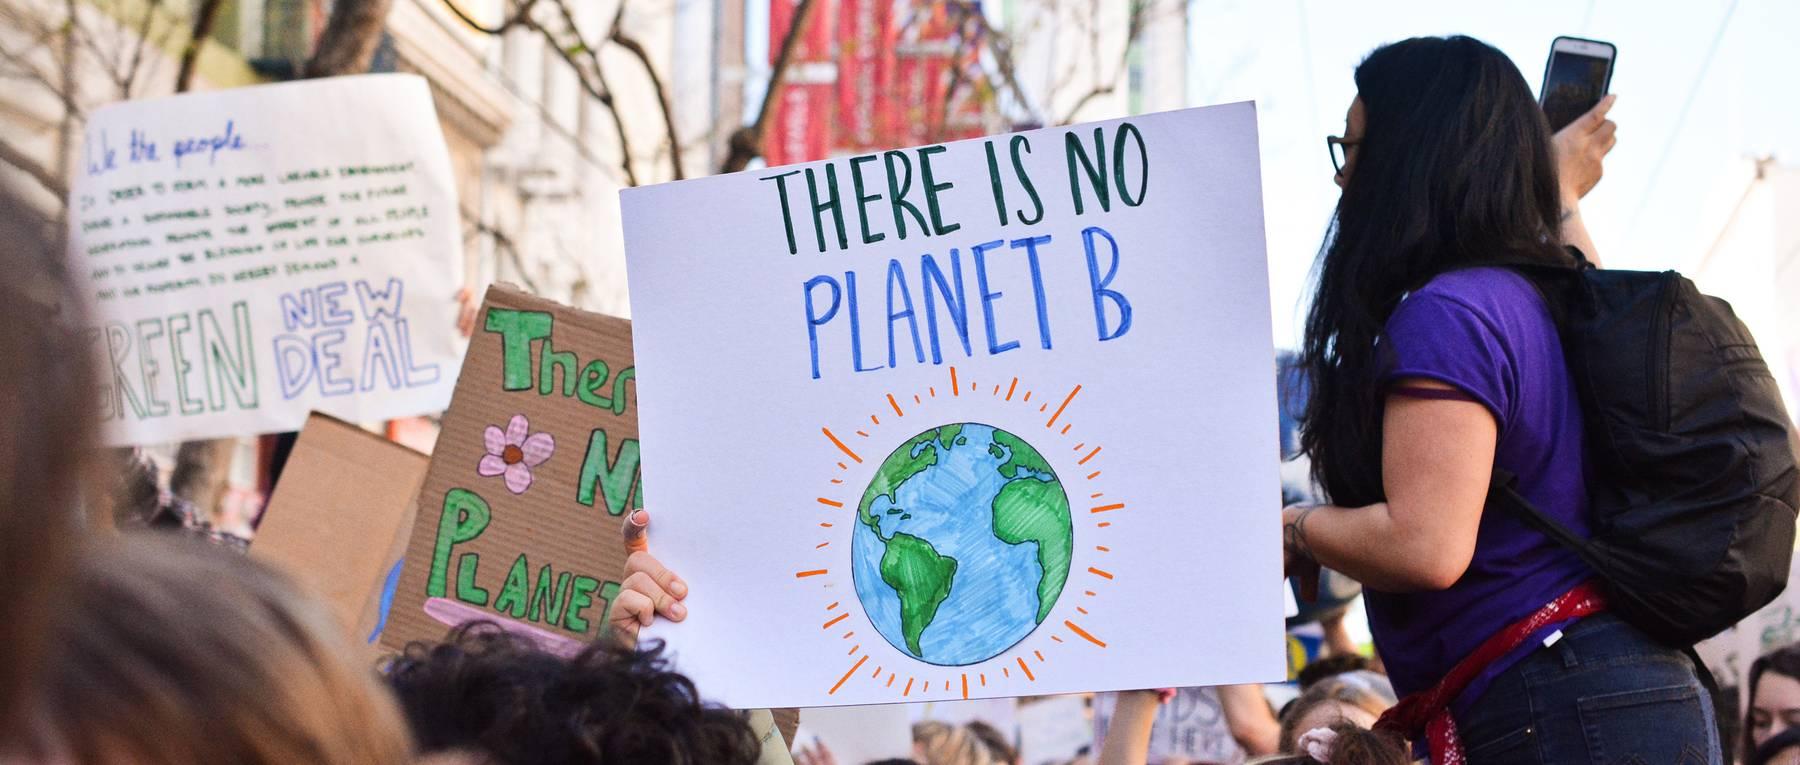 blog-climate-change-hero.jpg